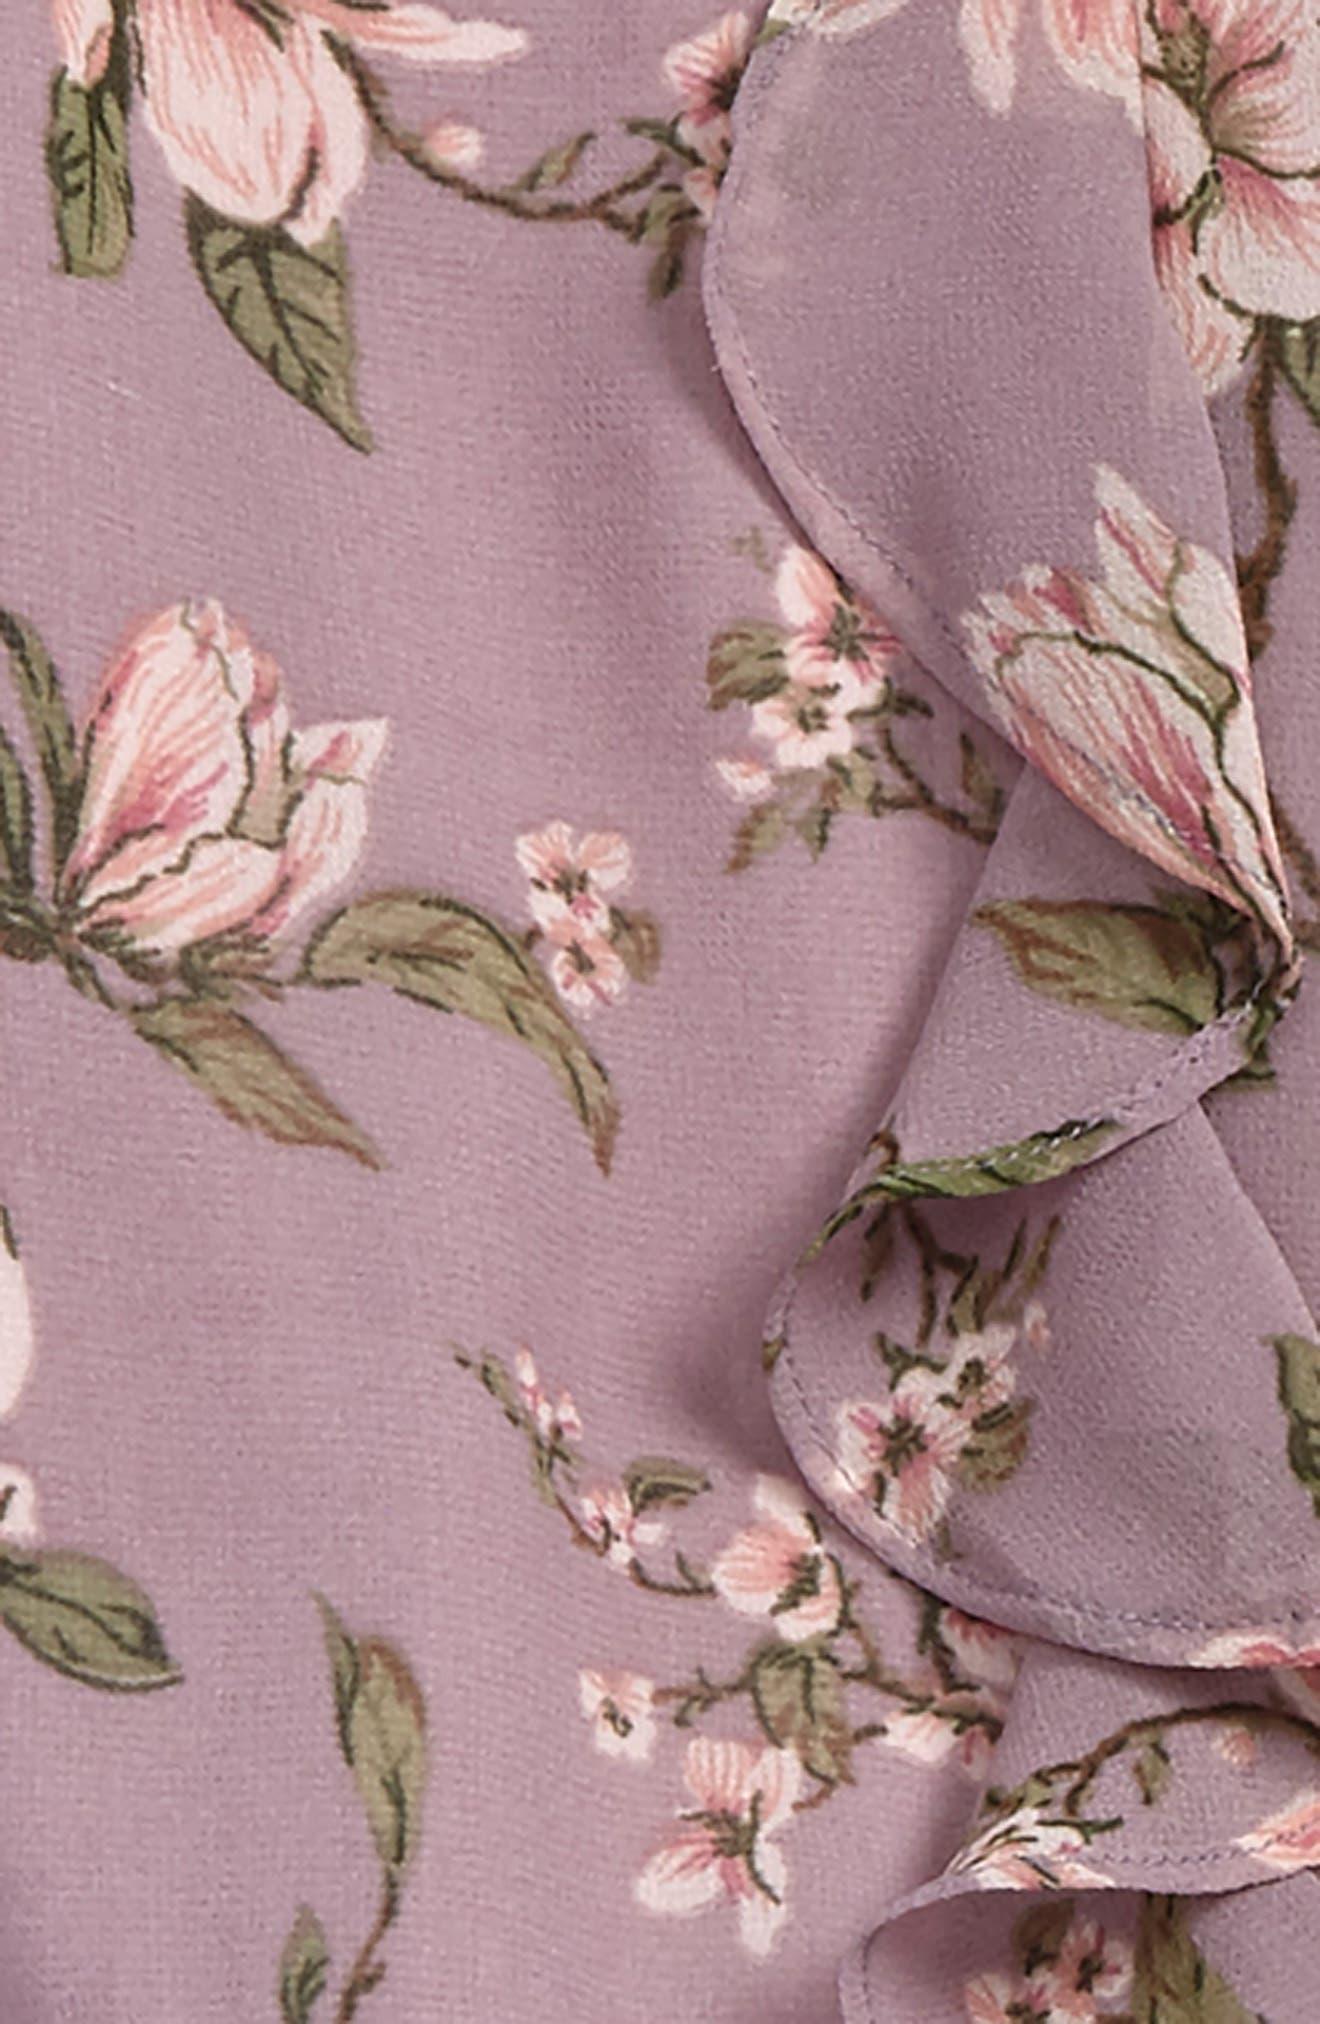 Magnolia Floral Romper,                             Alternate thumbnail 2, color,                             024